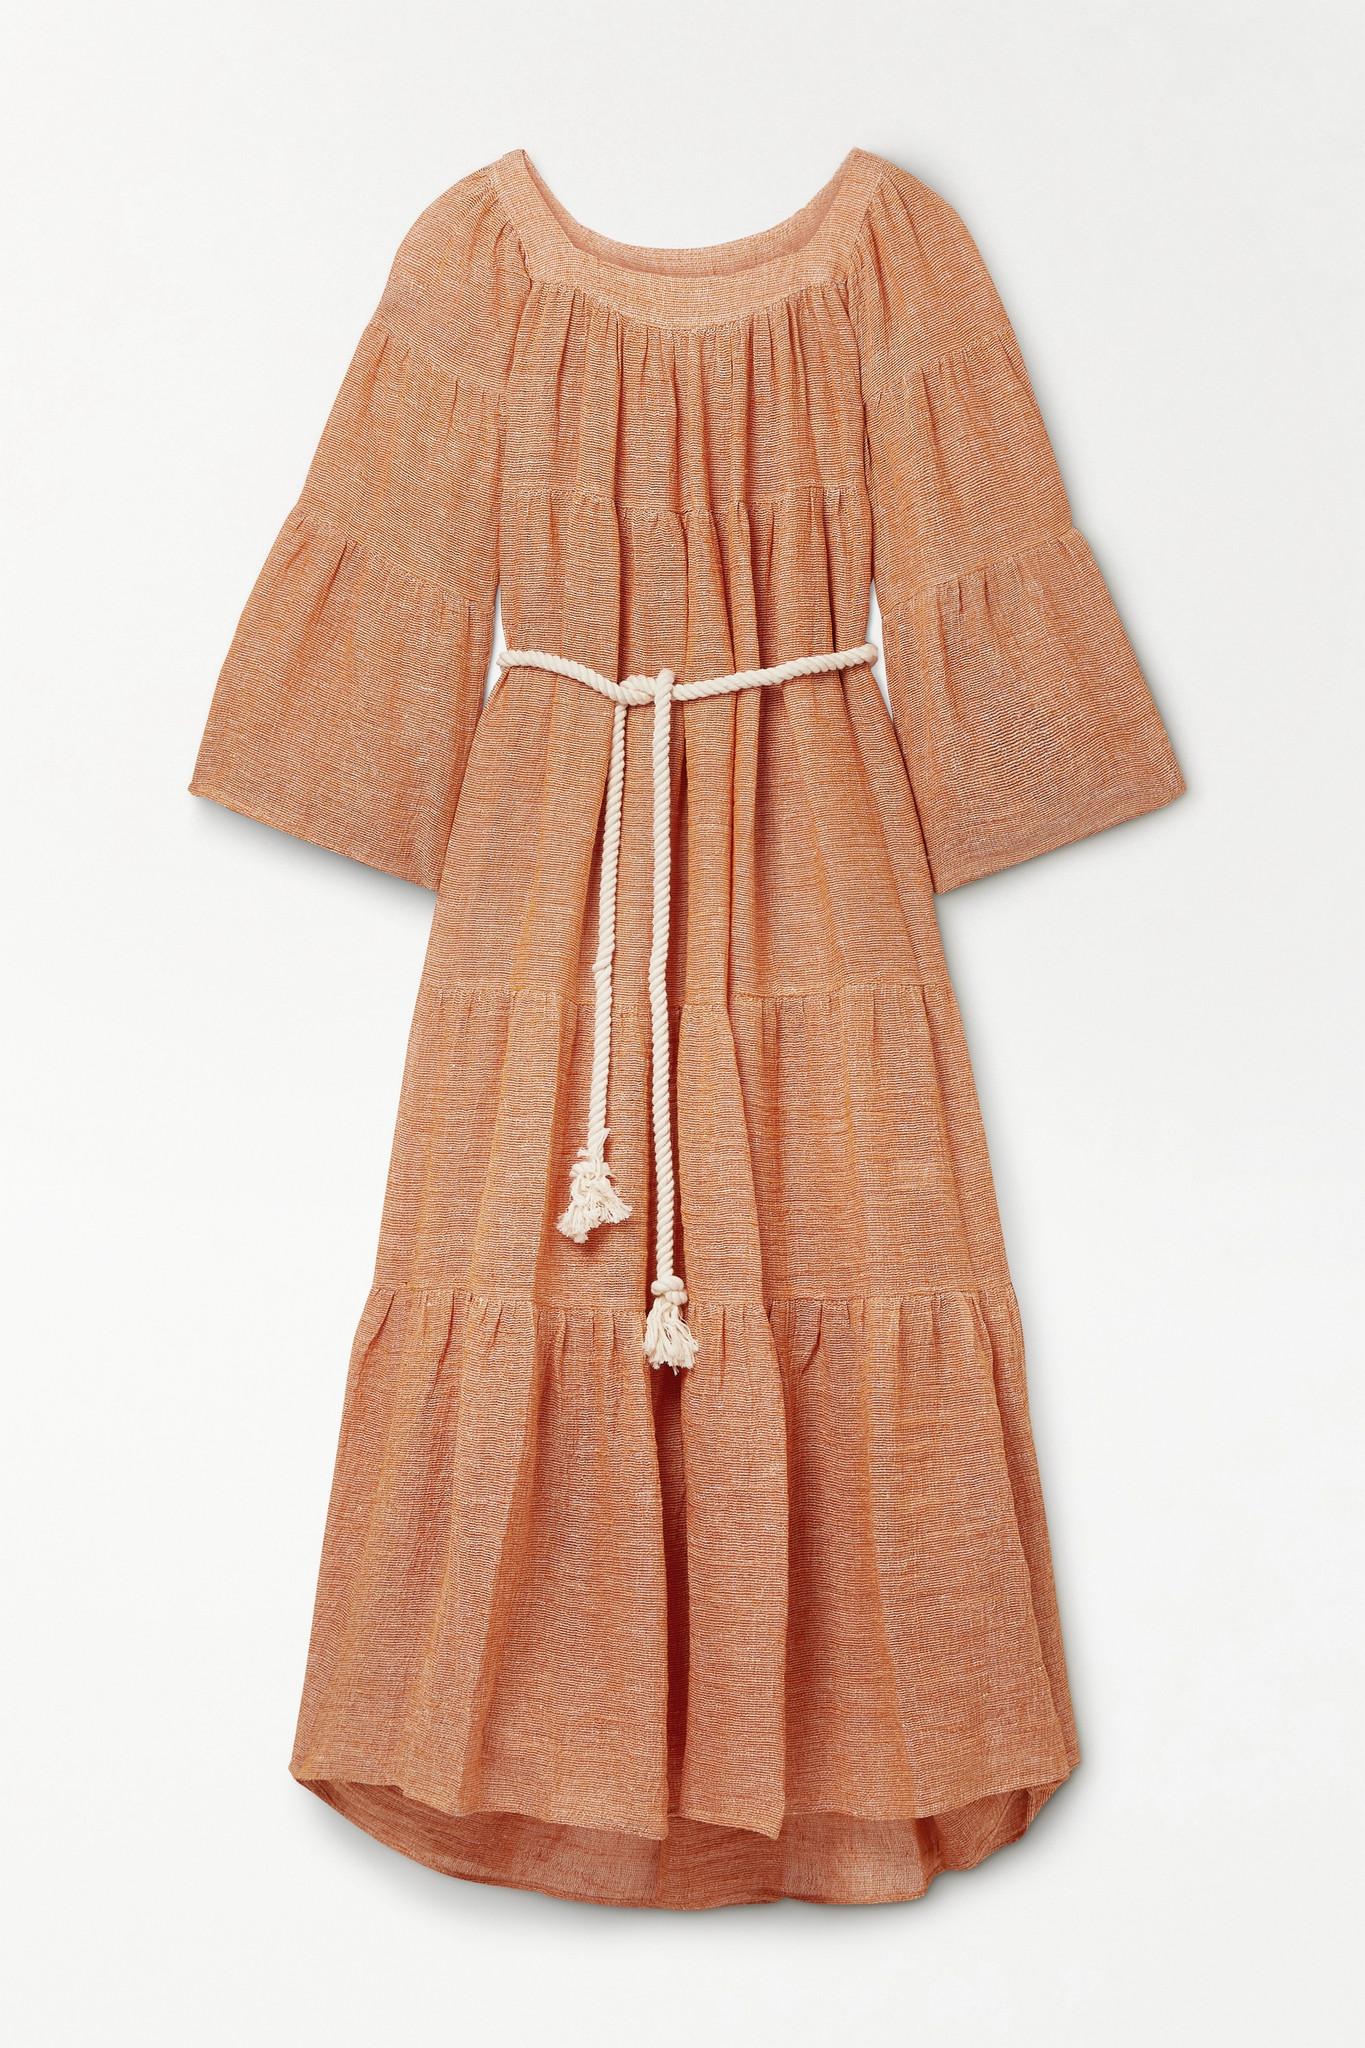 LISA MARIE FERNANDEZ - 【net Sustain】大廓形配腰带层接式亚麻混纺薄纱超长连衣裙 - 橙色 - 2